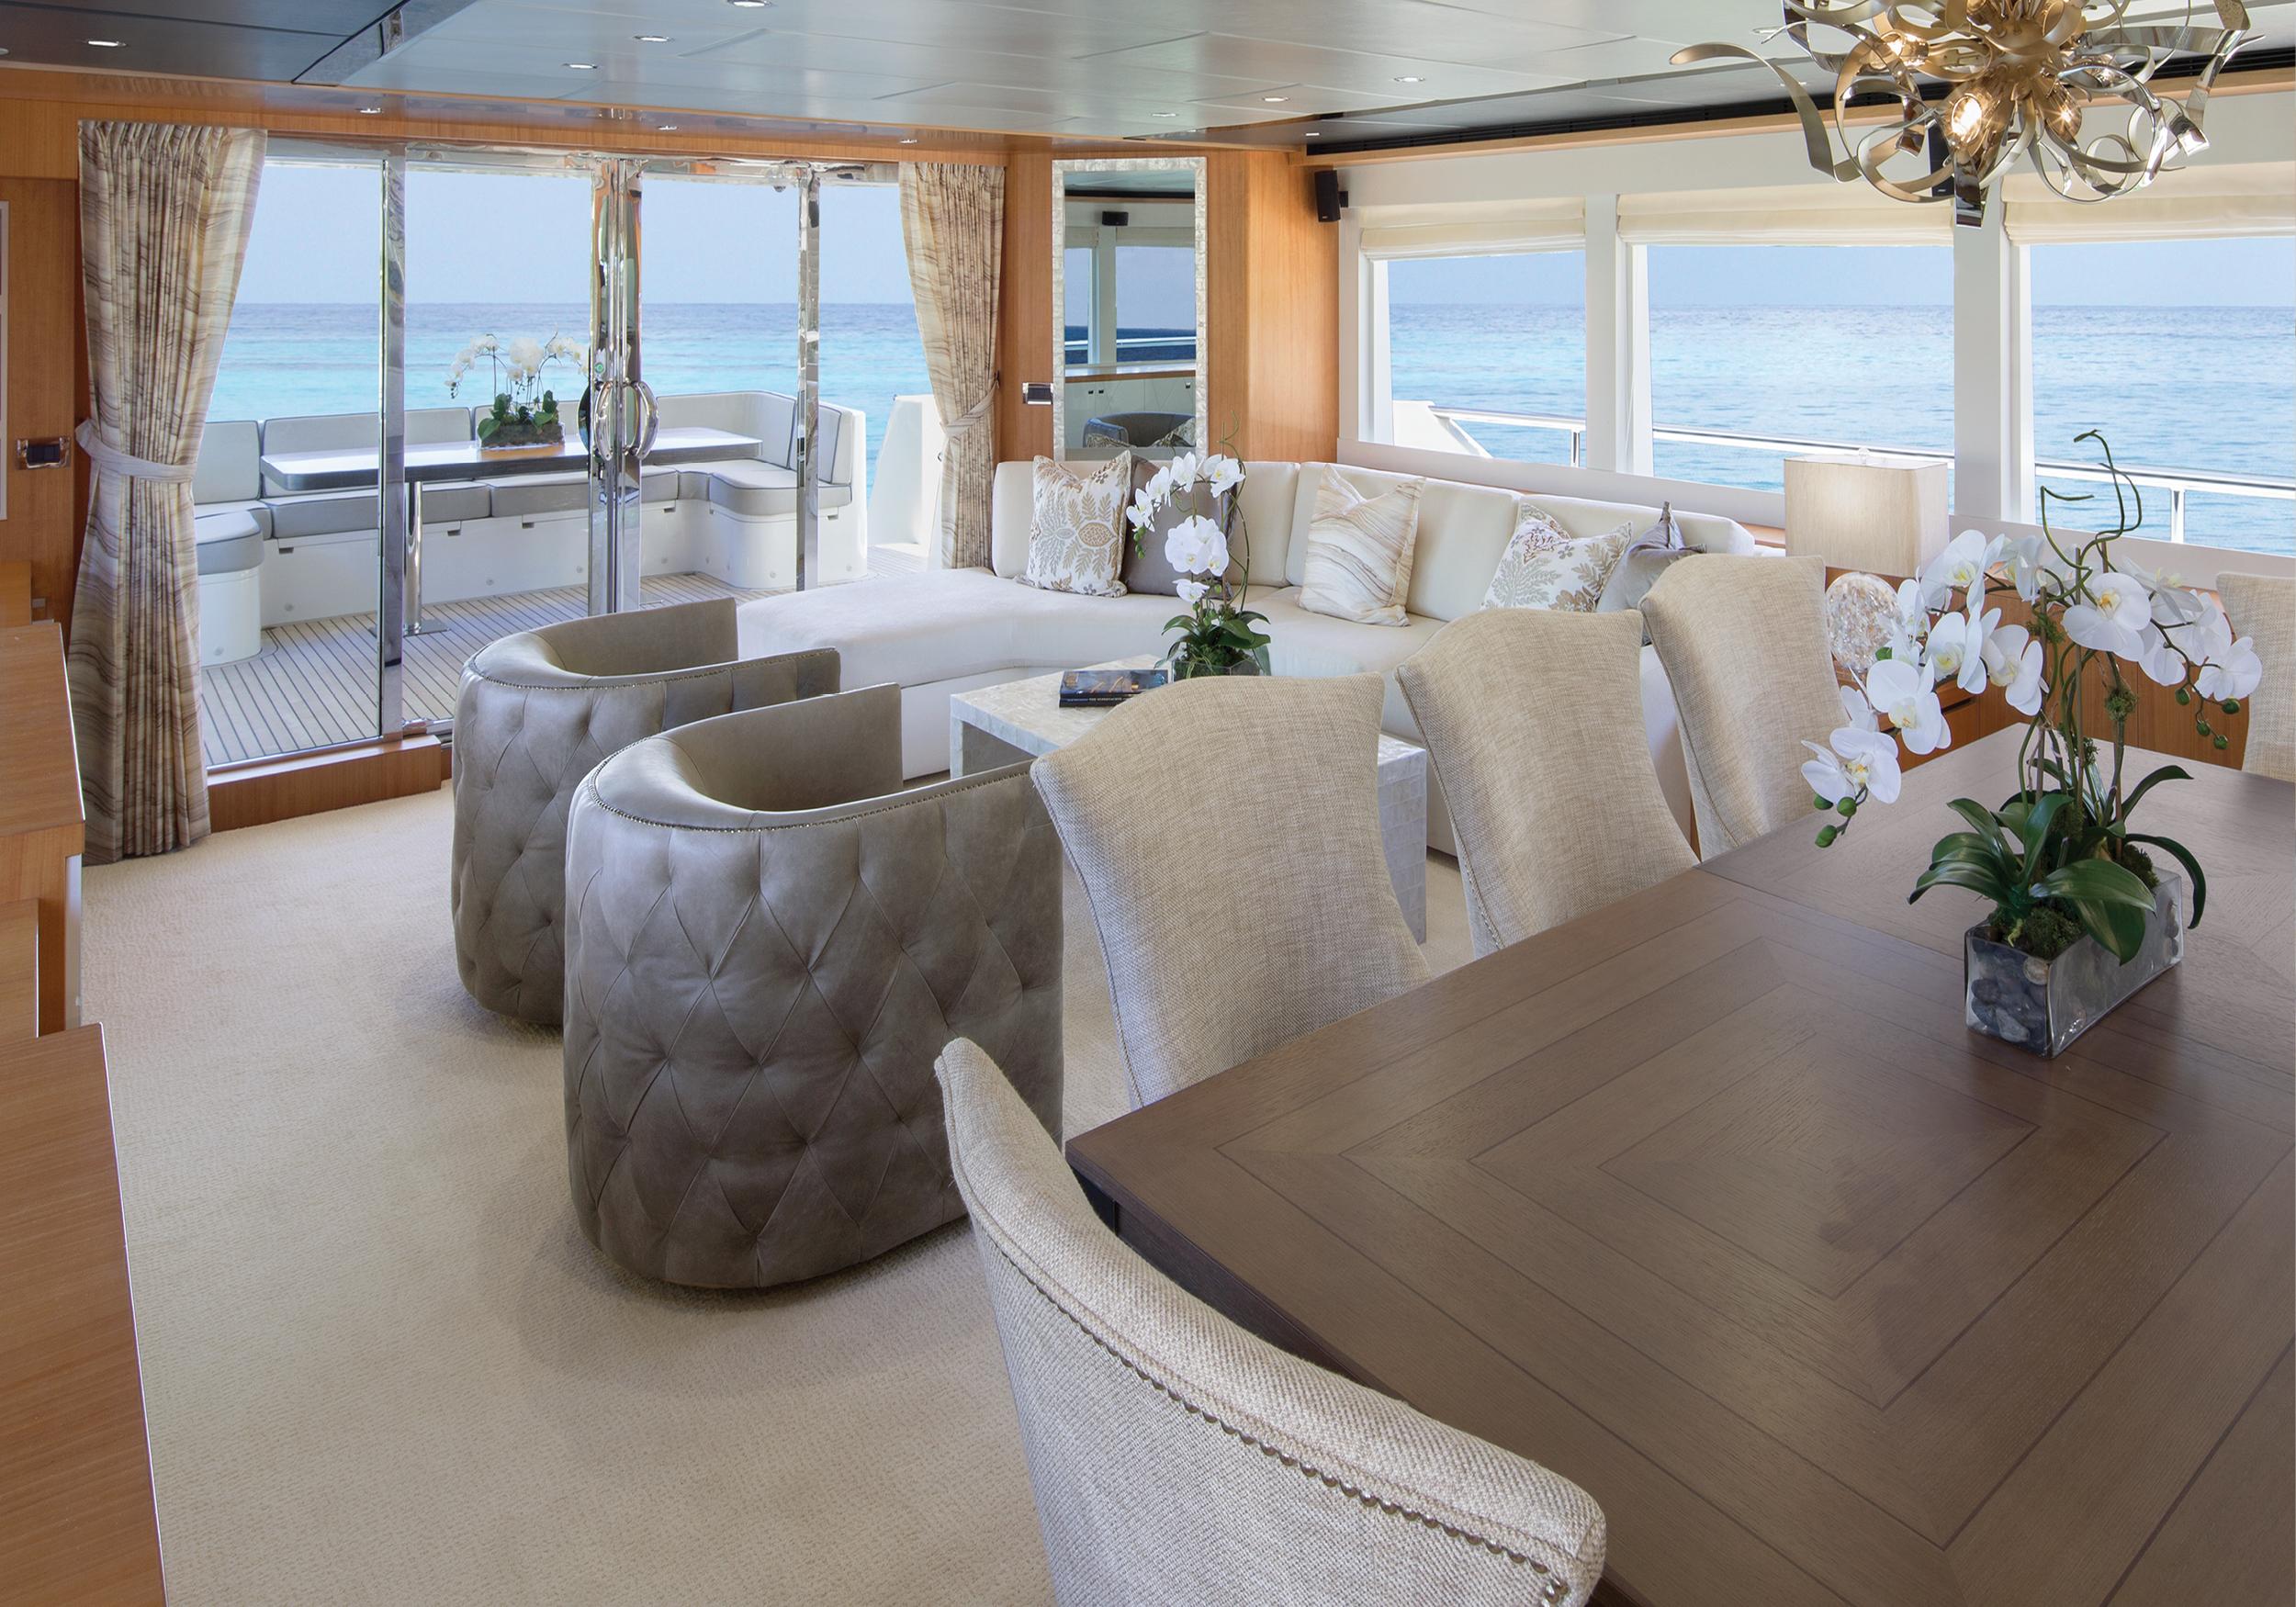 Karen-Lynn-Interior-Design-Yacht-Johnson93-3.jpg